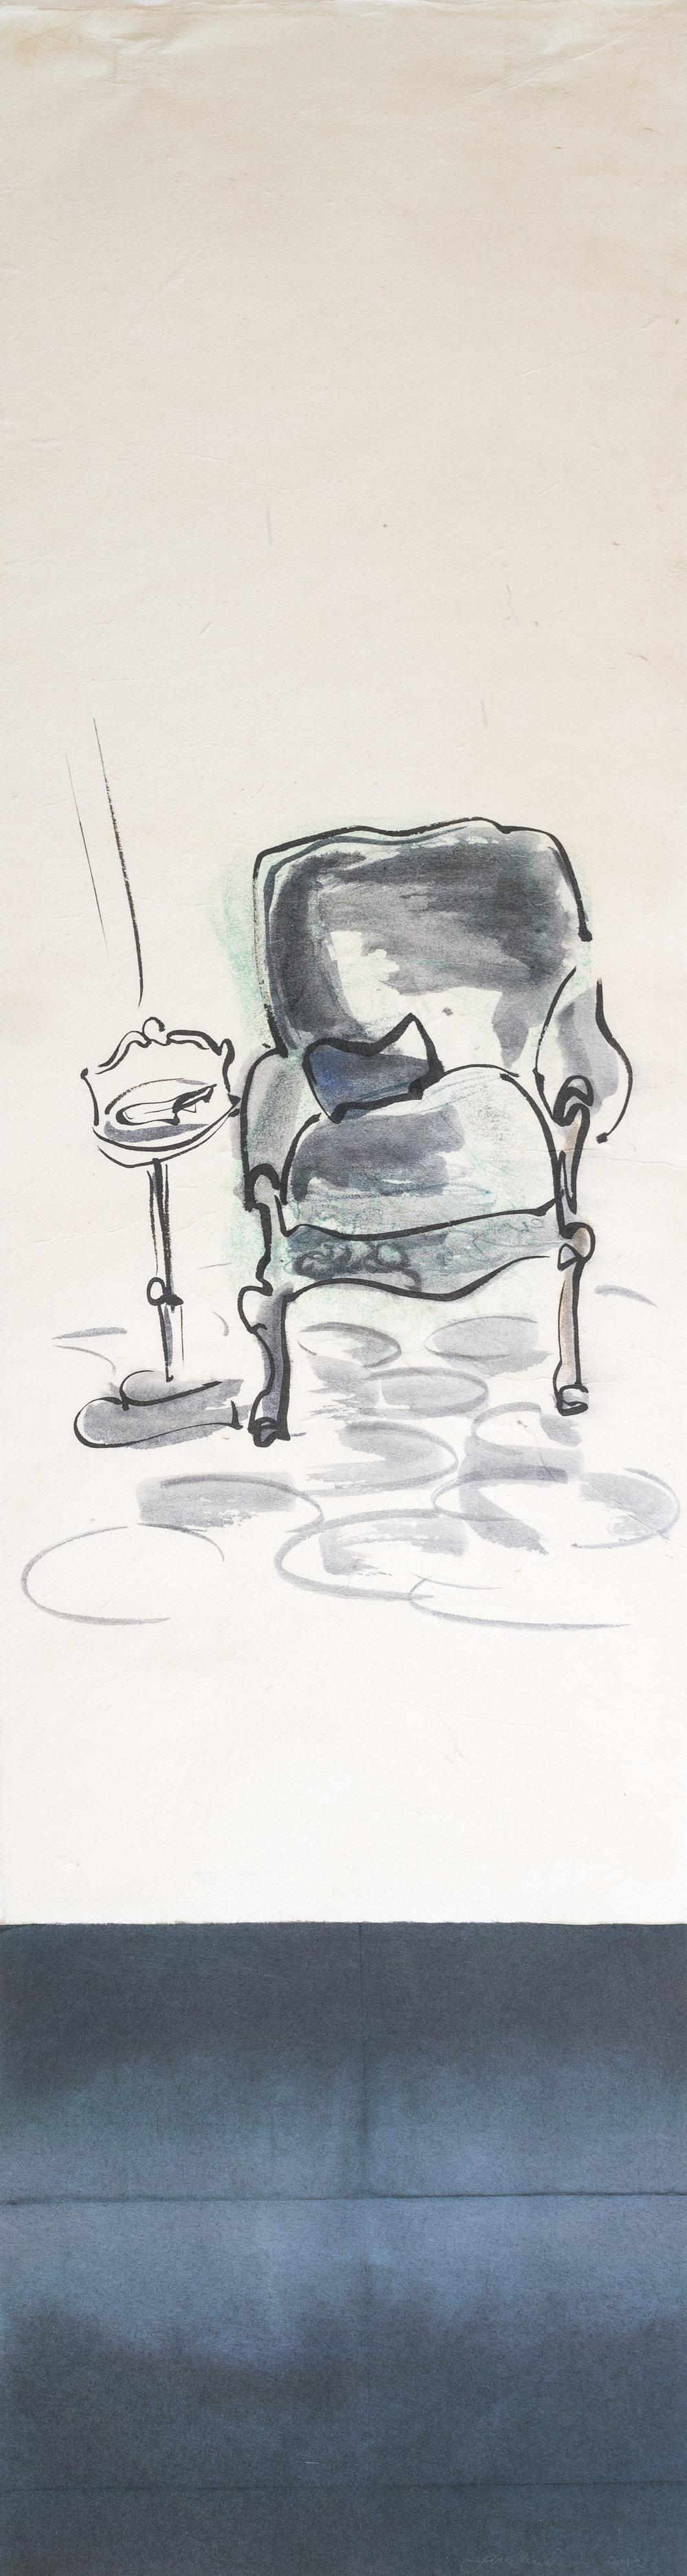 """Grandpop's chair"" pastel, ink on paper 42""x11"" 2002 NFS"